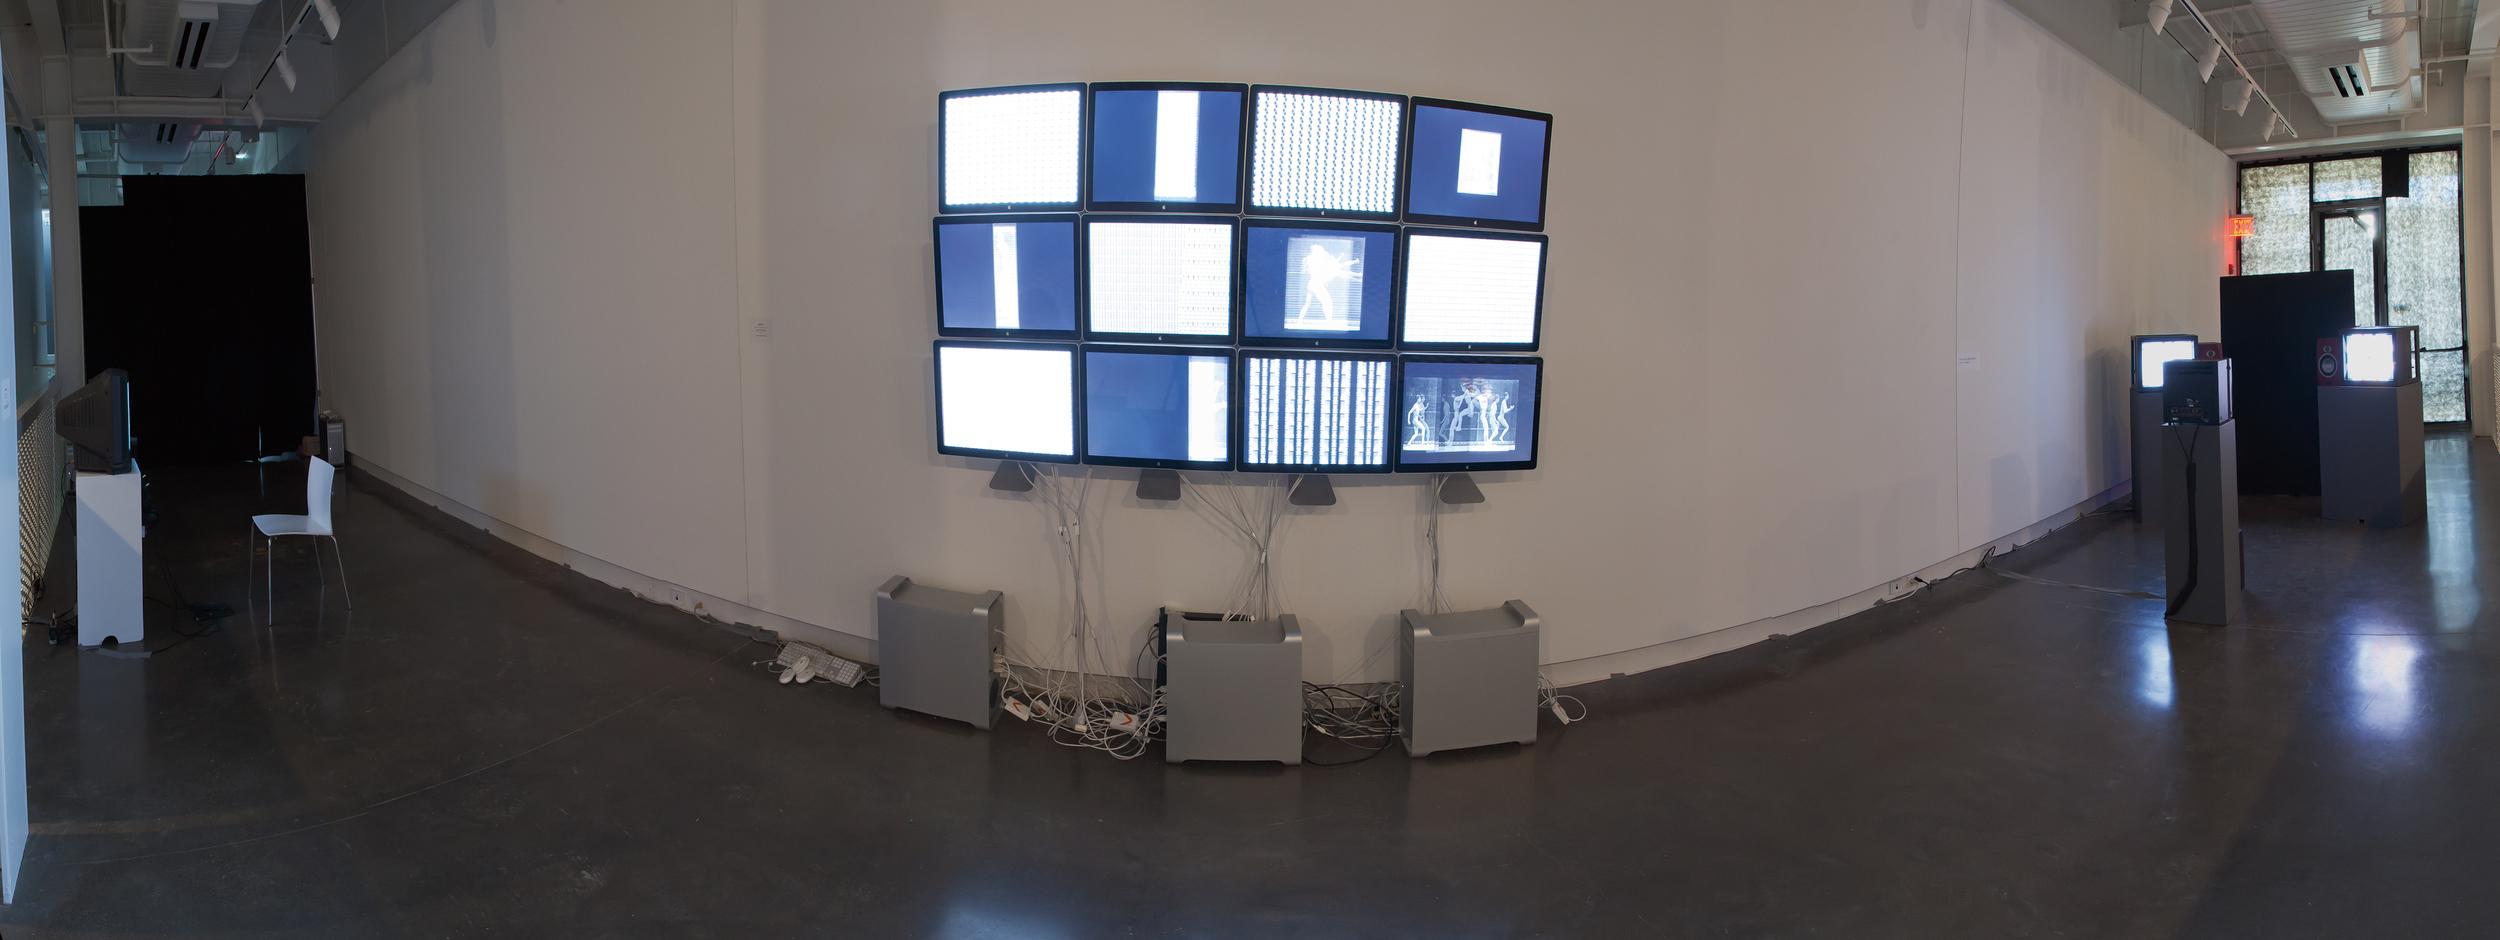 Muybridge video installation still panoramic.jpg